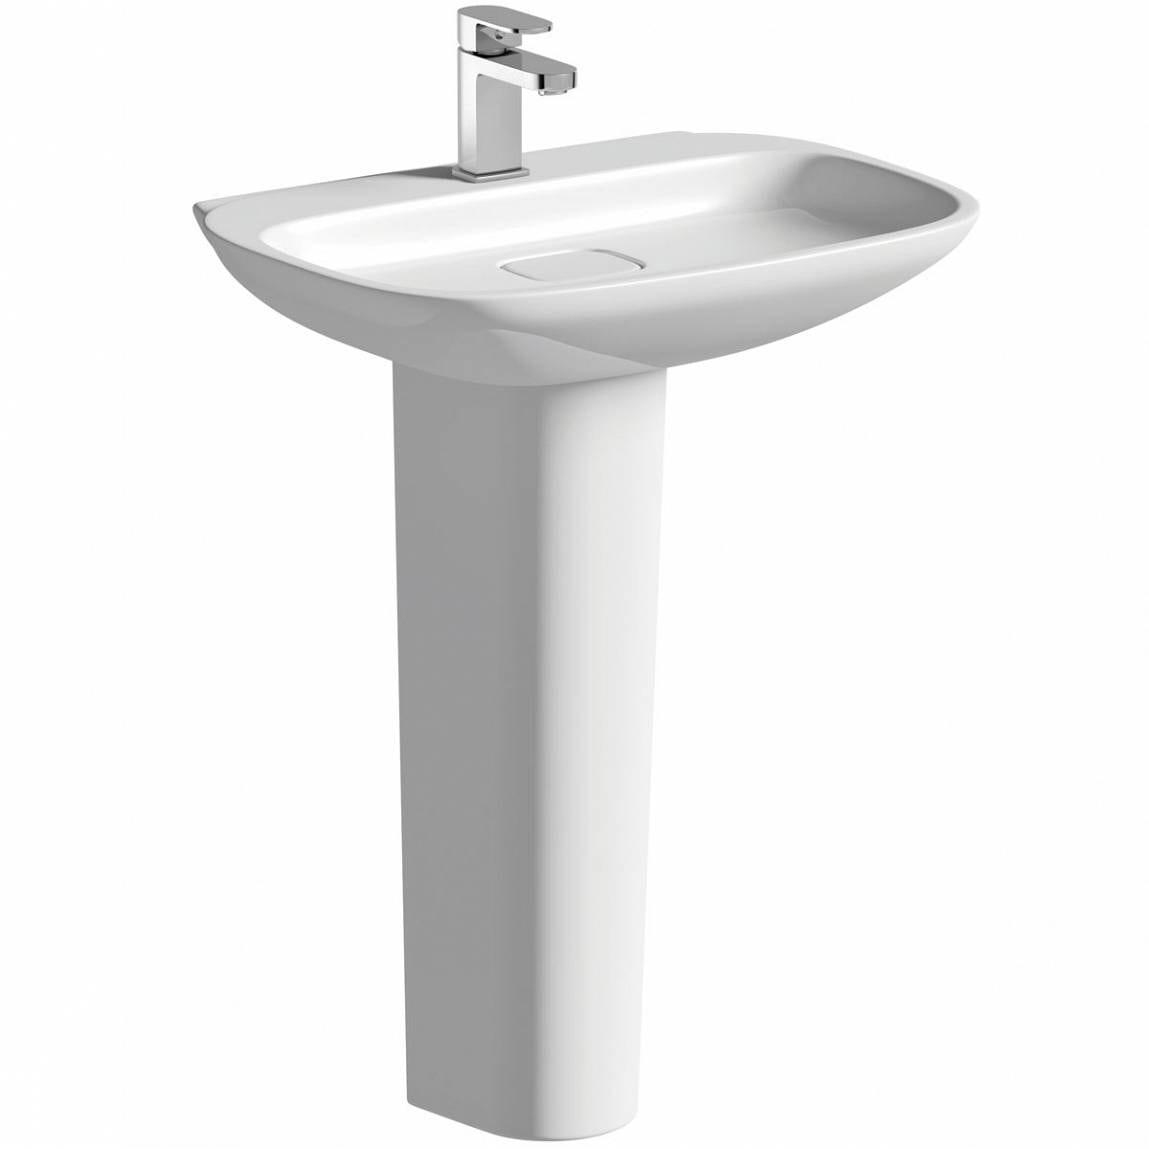 Heath 1TH 600mm Basin and Full Pedestal